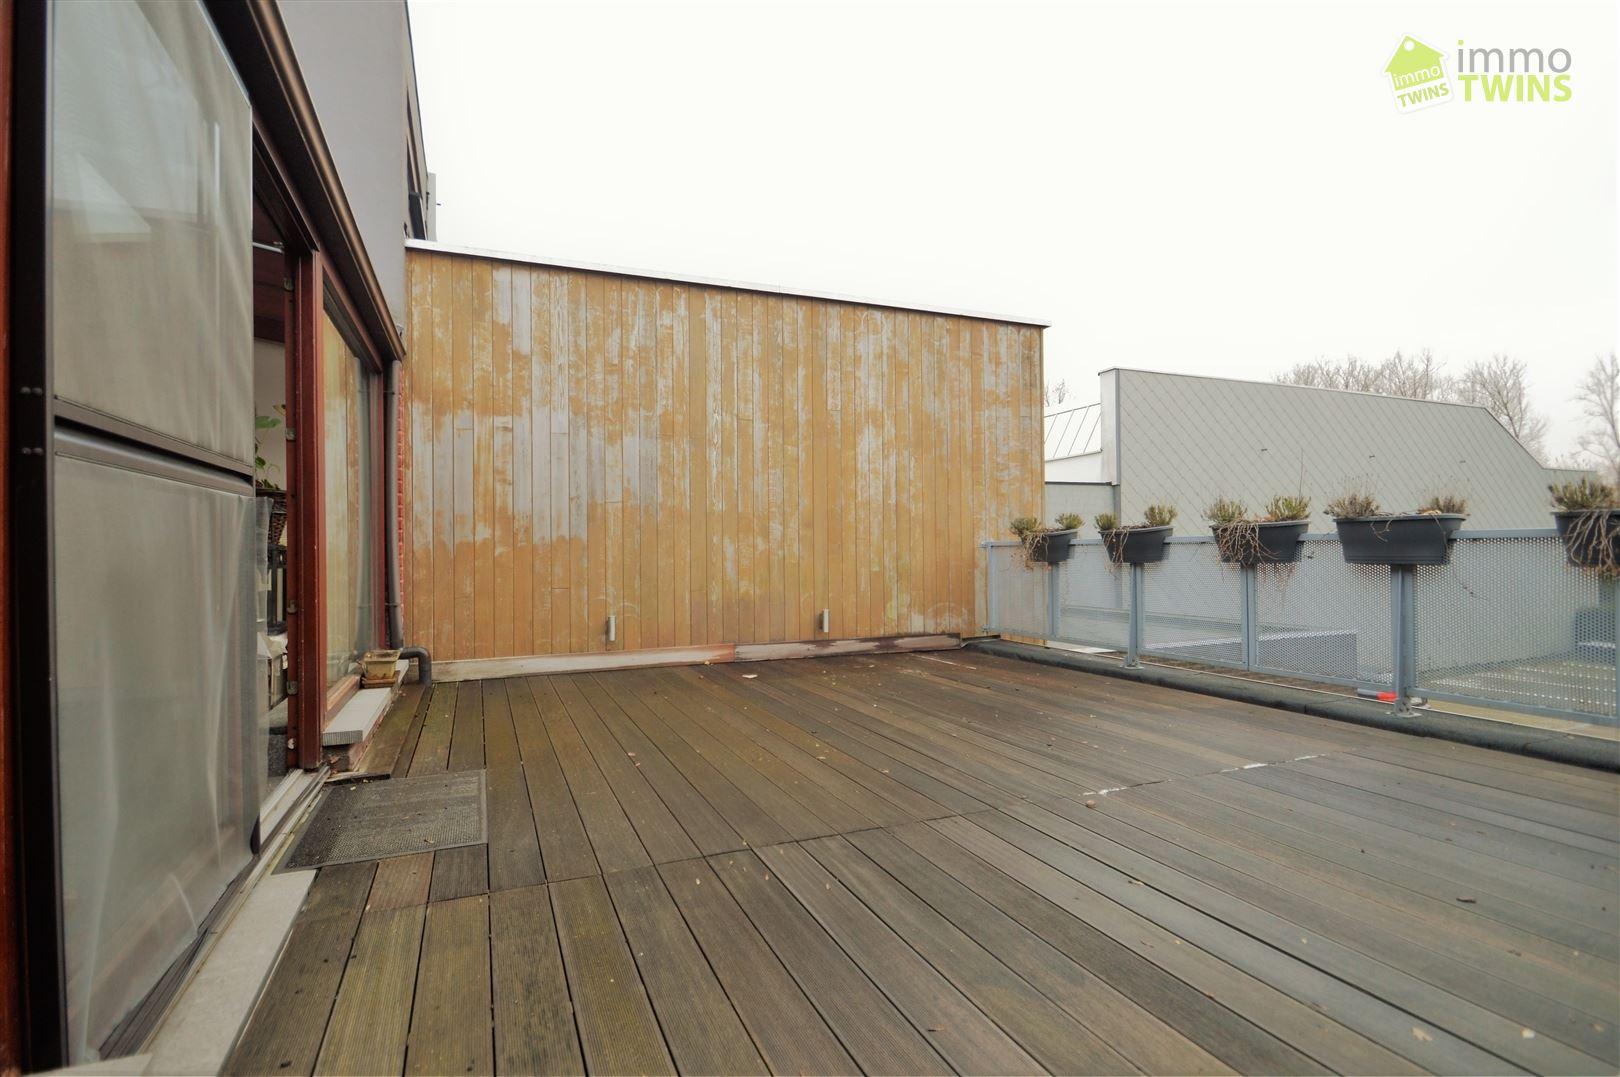 Foto 9 : Duplex/Penthouse te 2890 SINT-AMANDS (België) - Prijs € 429.000